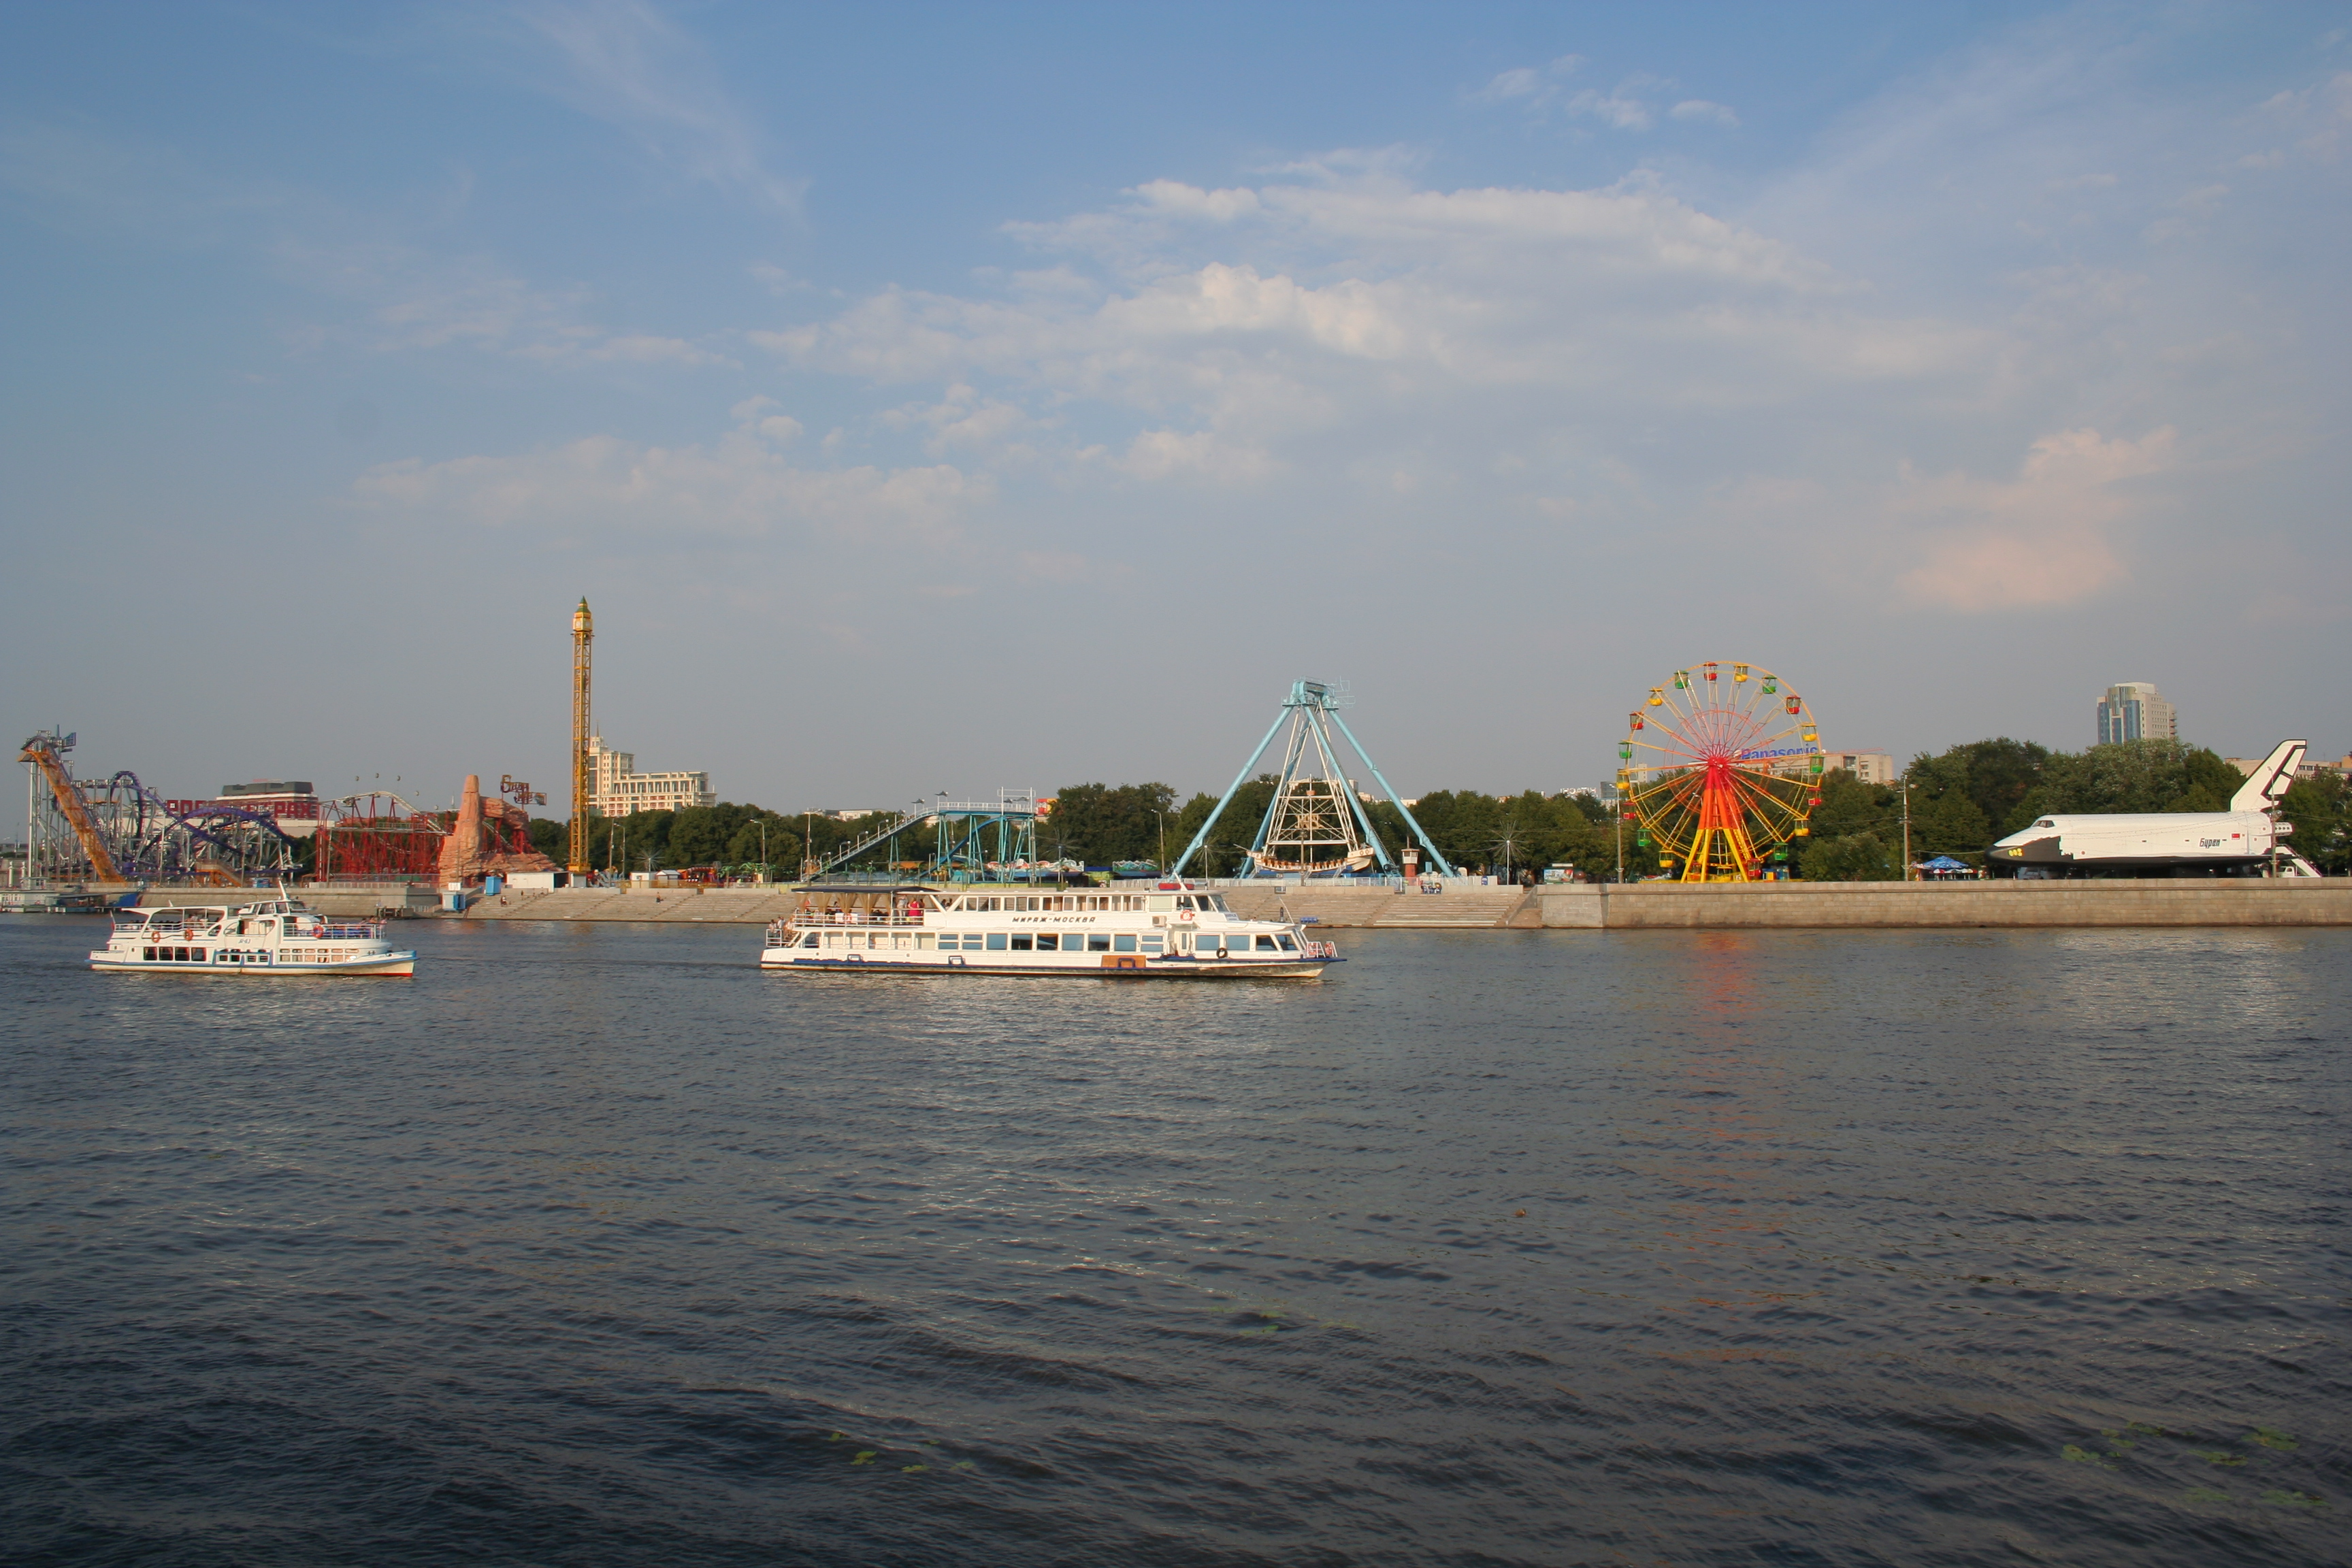 http://upload.wikimedia.org/wikipedia/commons/0/0c/Moscow_Gorky_Park_View_from_Frunzenskaya_Embankment_06.jpg